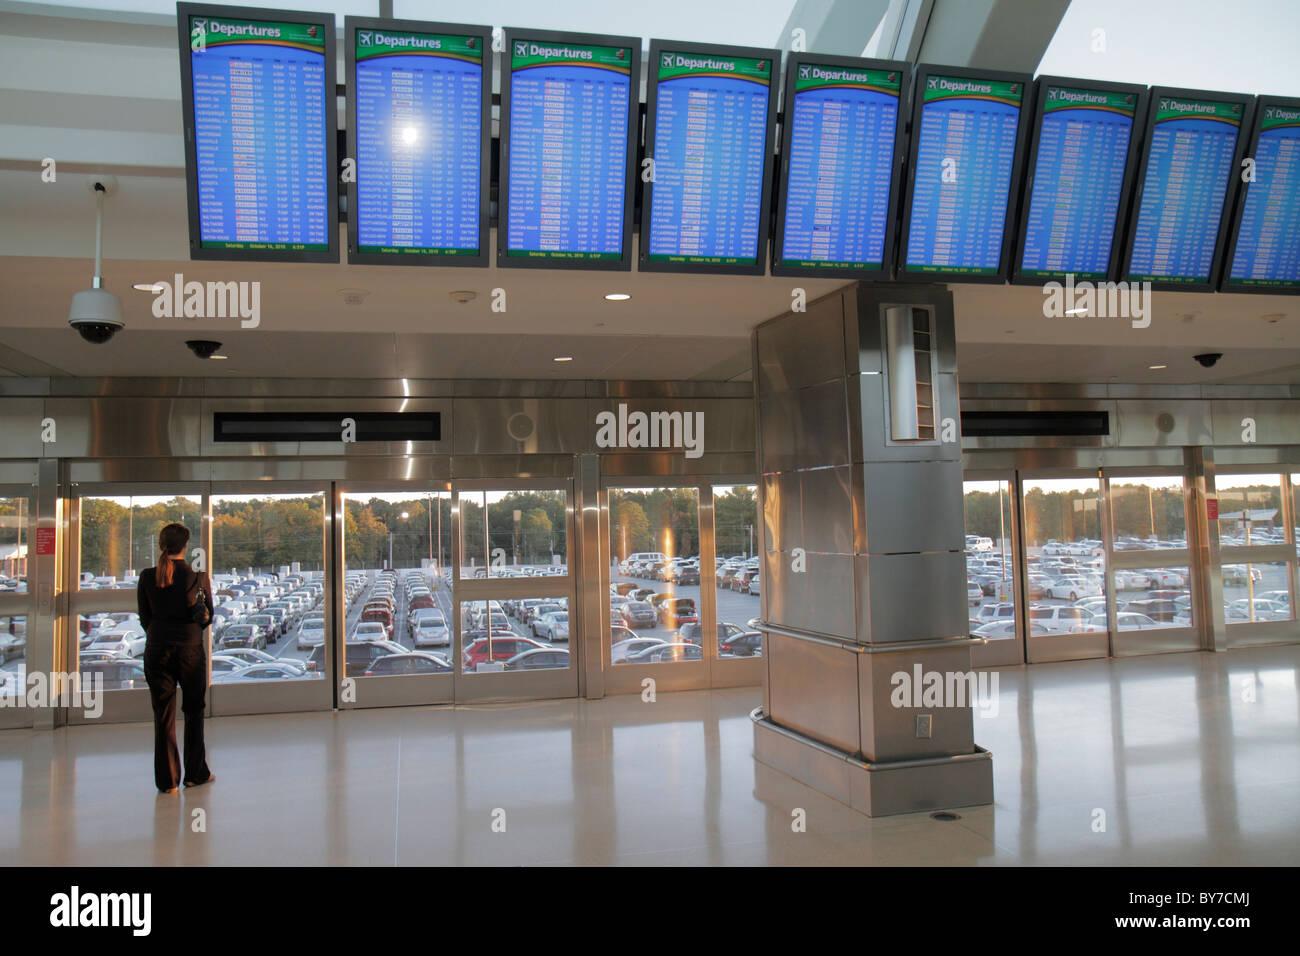 Georgia hartsfield jackson atlanta international airport atl skytrain platform automated people mover apm rental stock